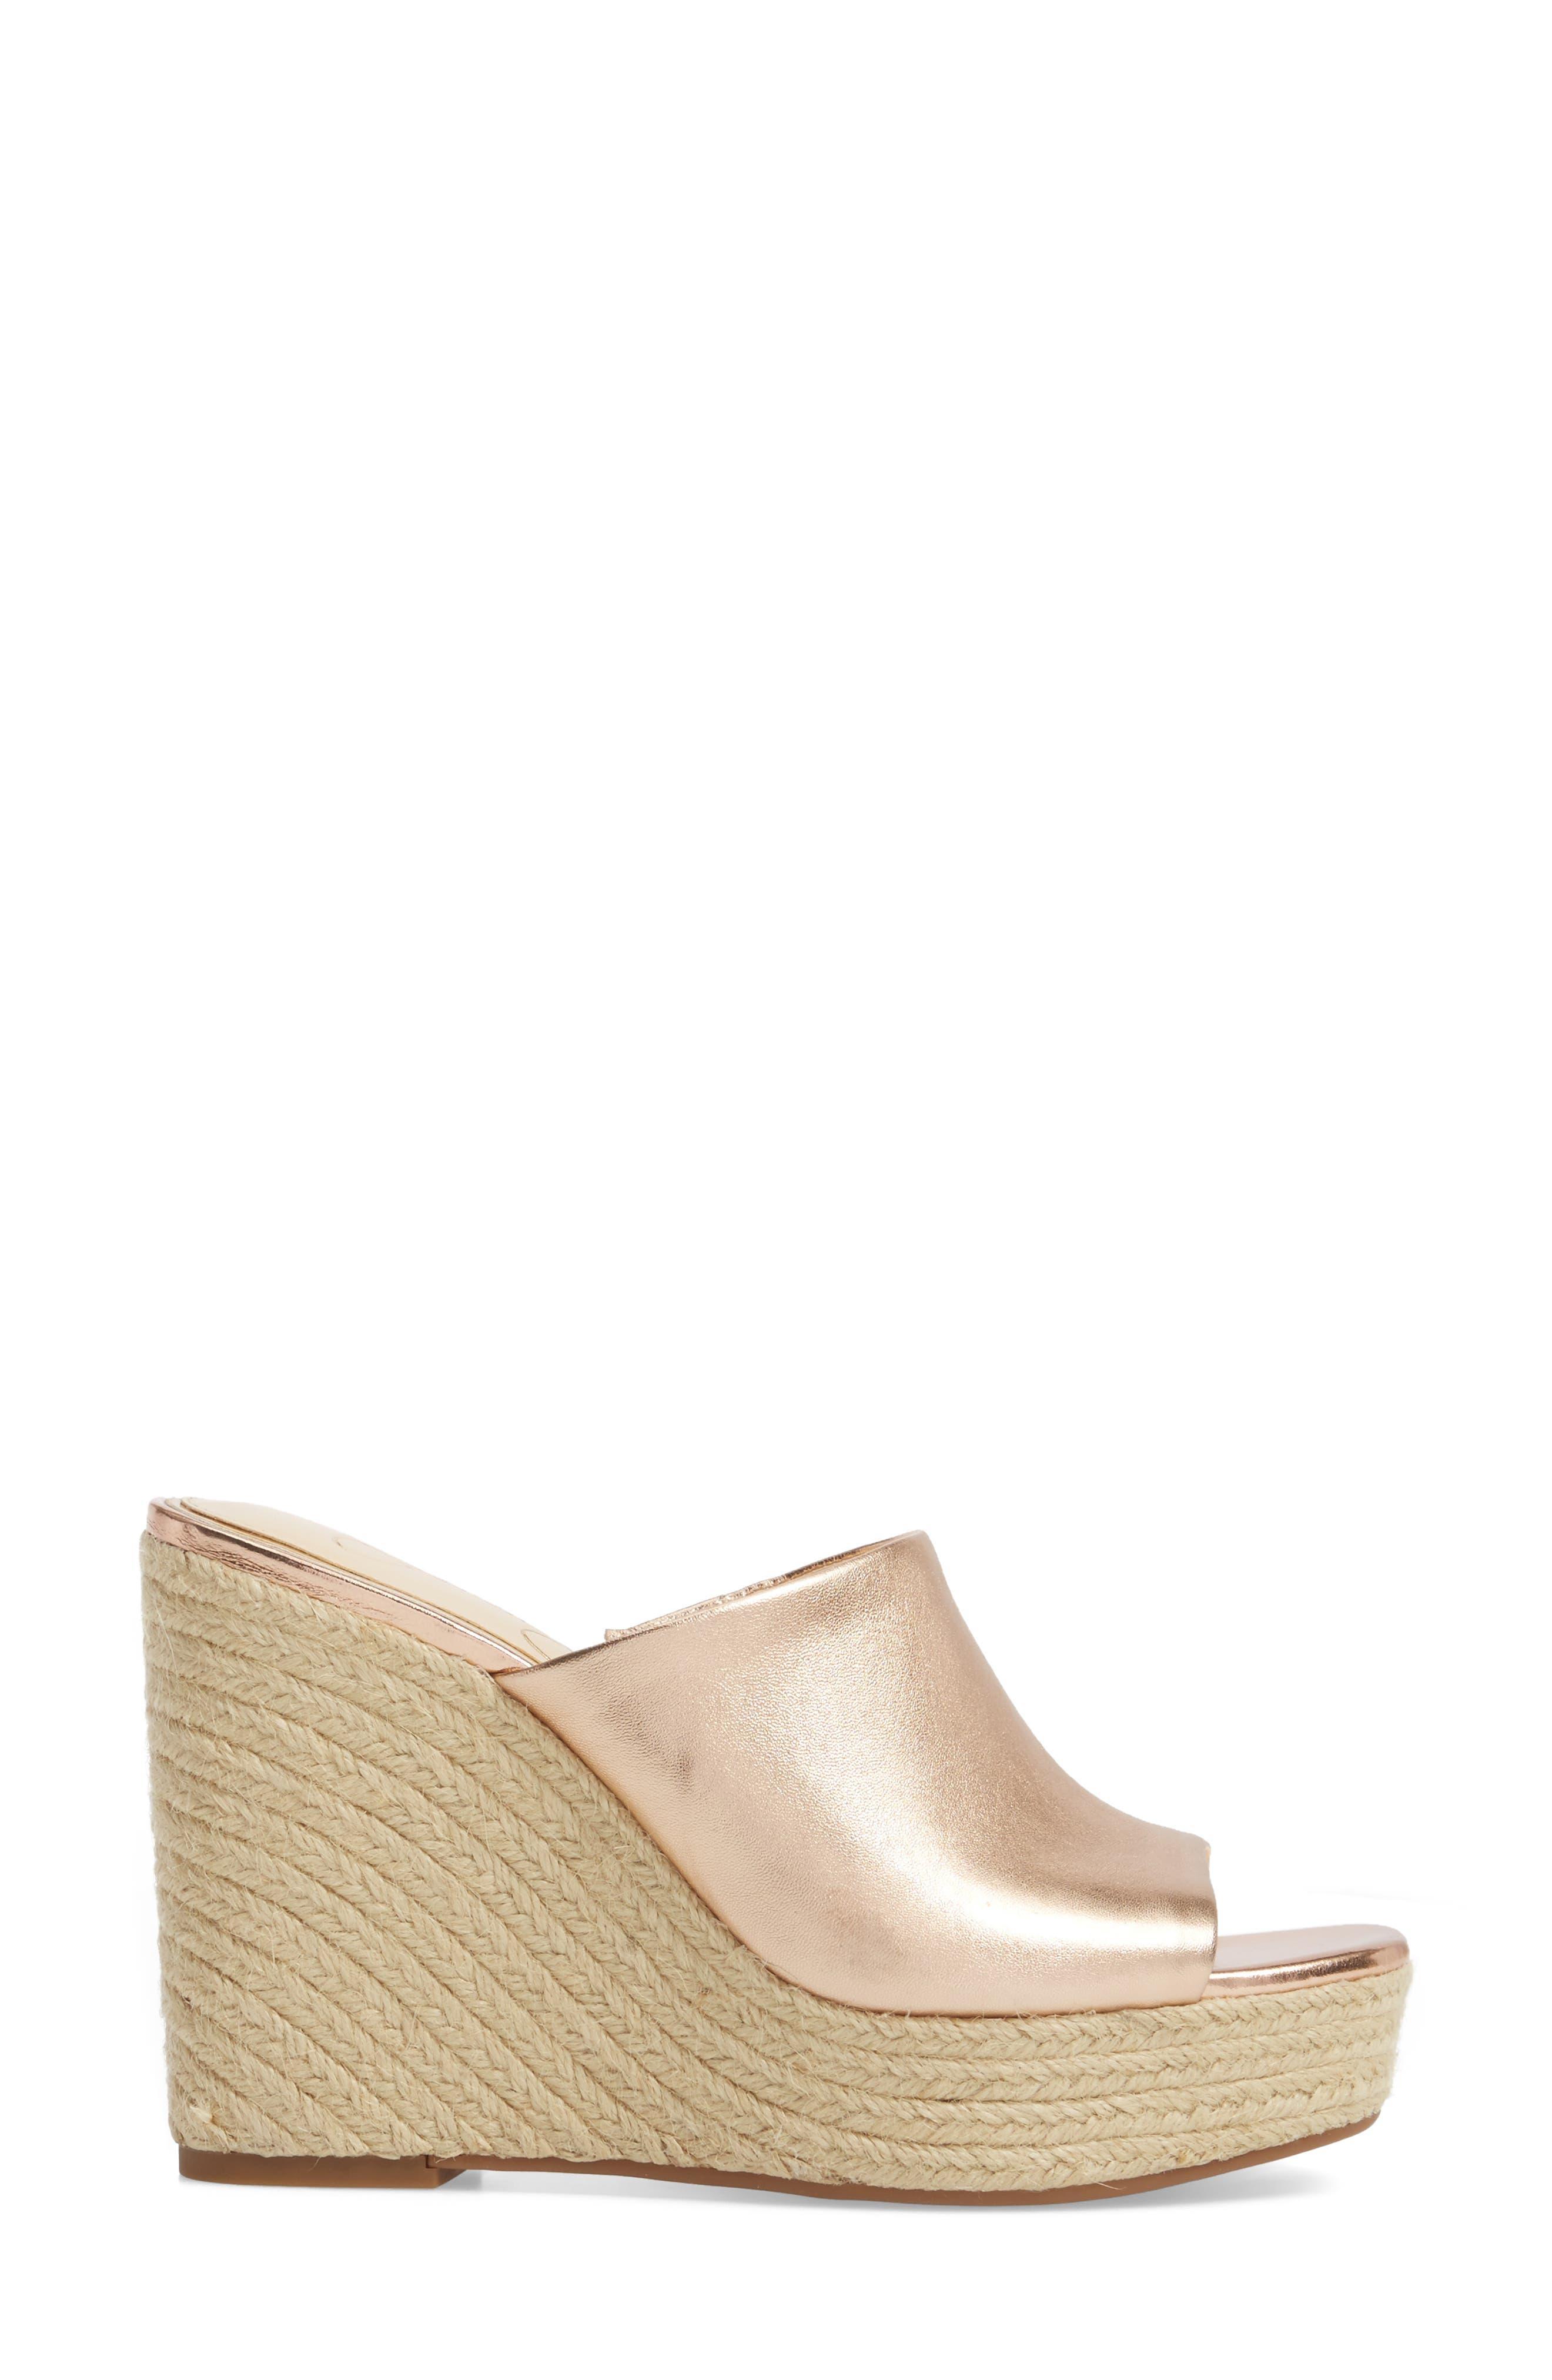 Sirella Platform Wedge Slide Sandal,                             Alternate thumbnail 3, color,                             Pale Rose Go